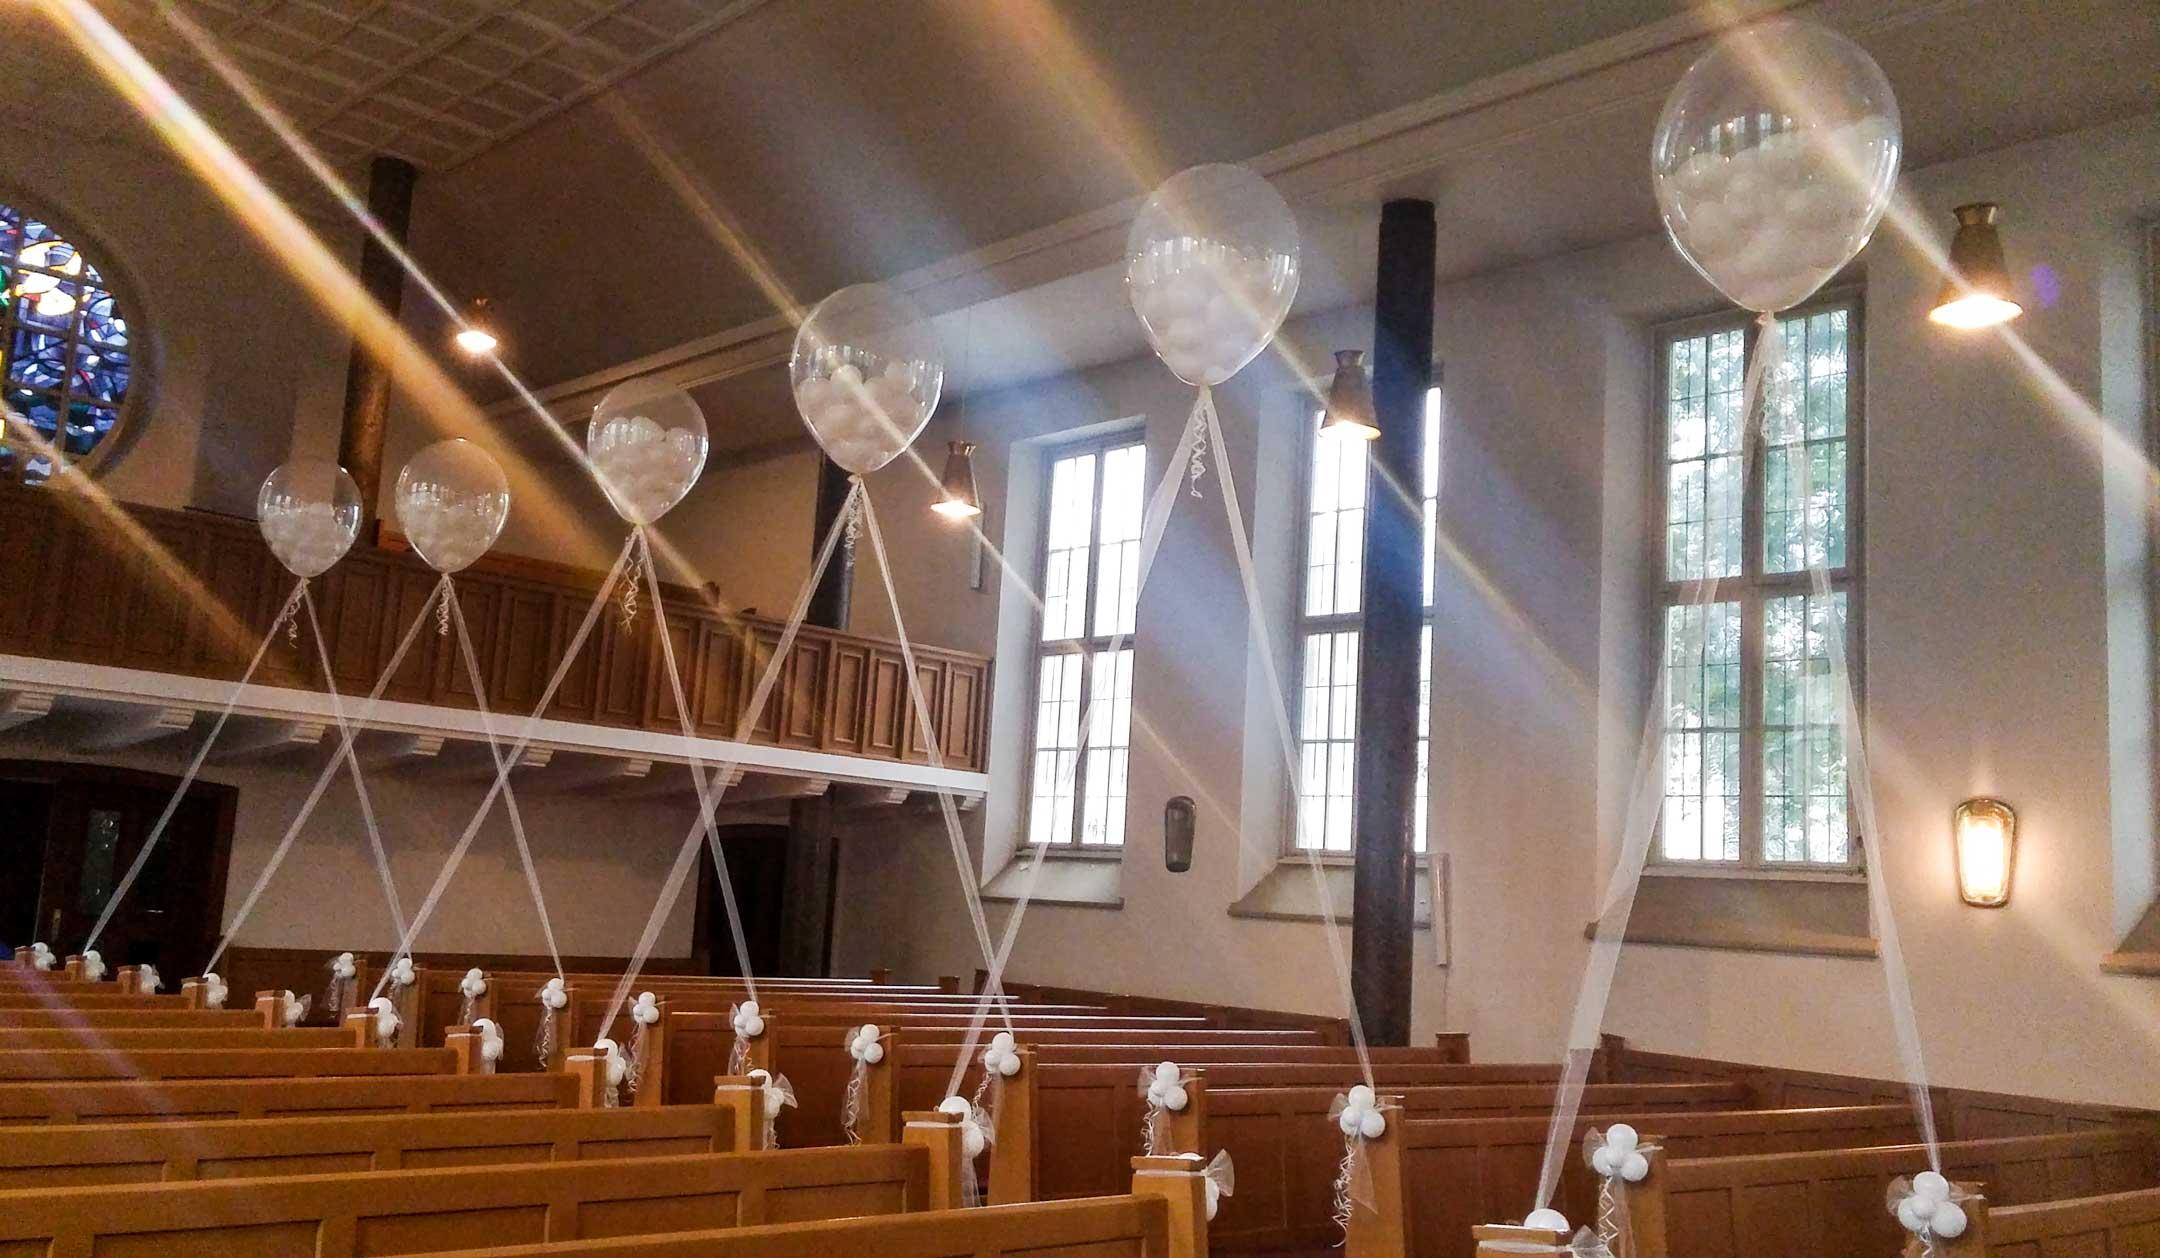 dekoration aus luftballons lufties ballons. Black Bedroom Furniture Sets. Home Design Ideas